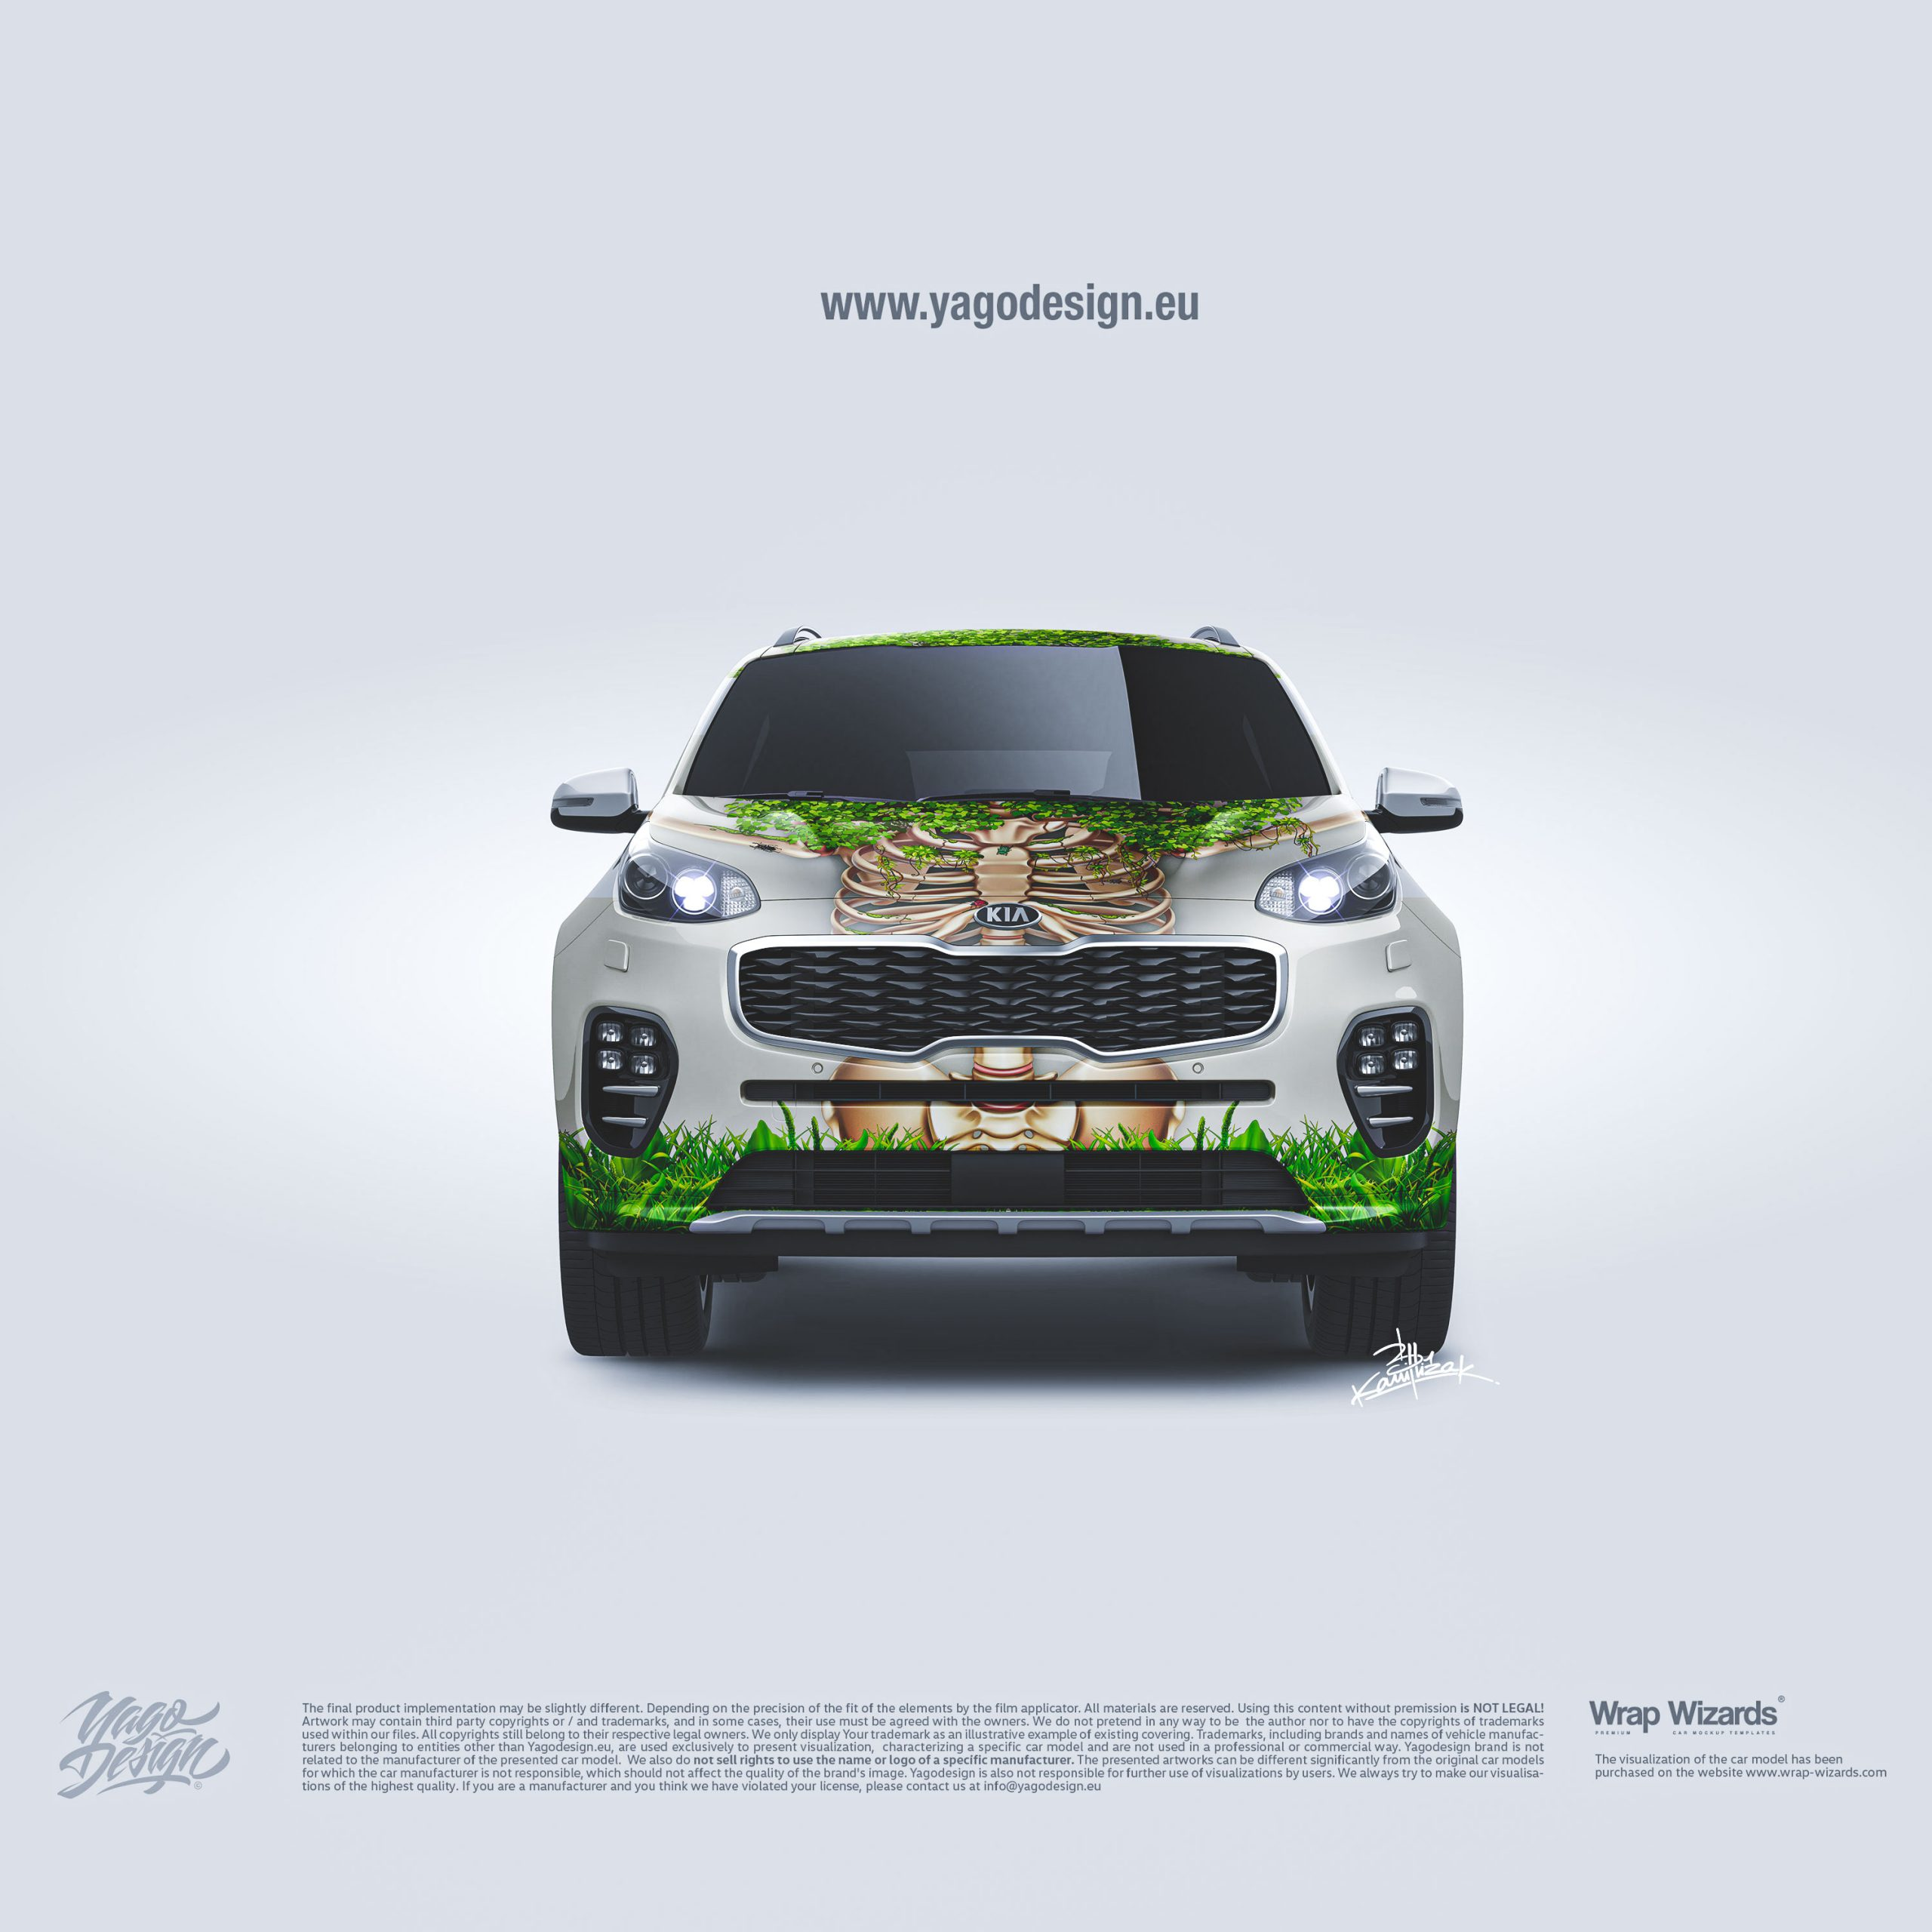 KIA-Sportage-2016-Livery-Design-By-Yagodesign-Automotive-Design-Studio-front-view-scaled